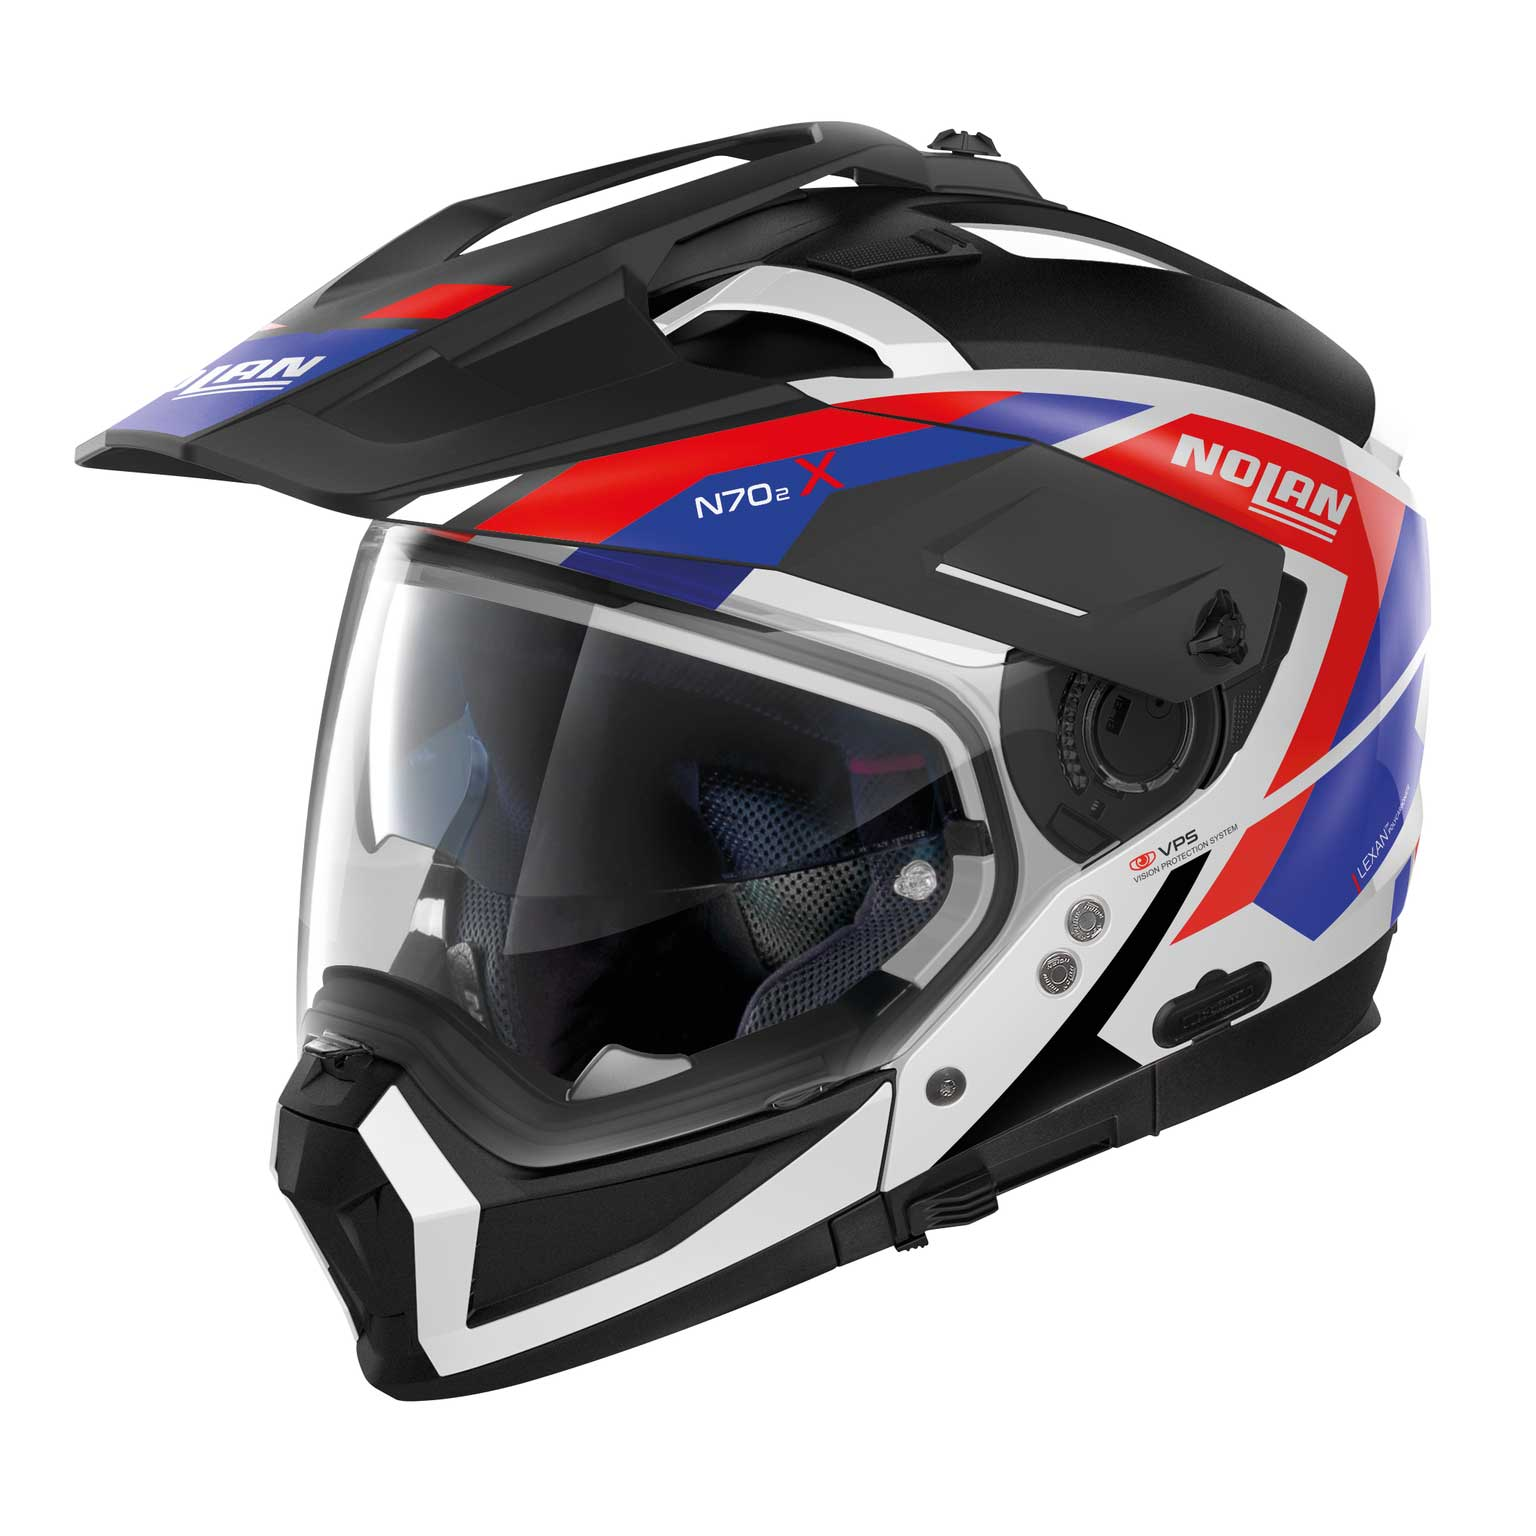 Nolan N70-2 X Grandes Alpes 24 Grey Orange Modular Adventure Motorcycle Helmet